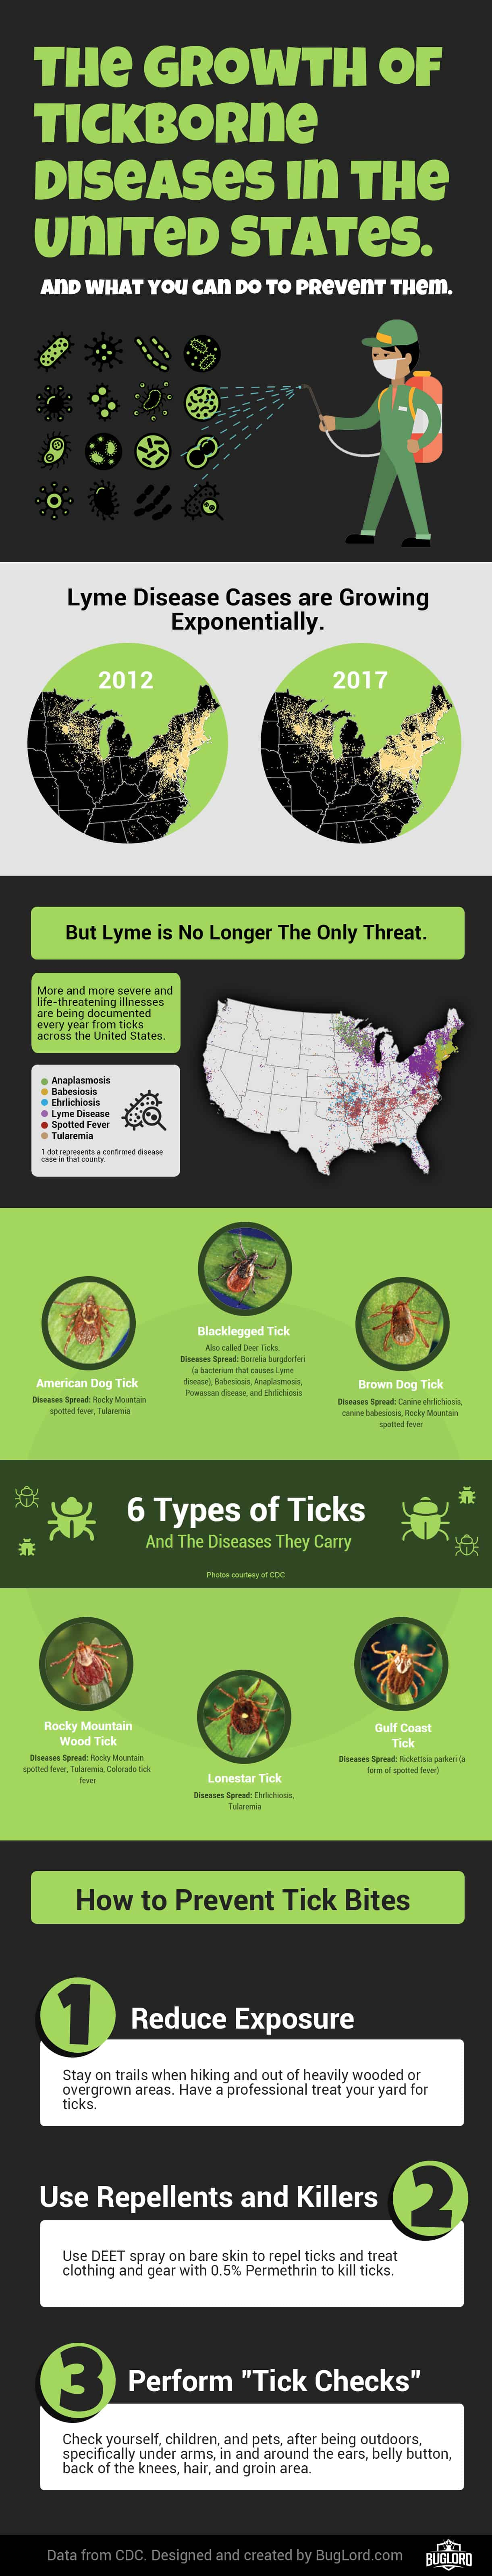 Types of ticks infographic